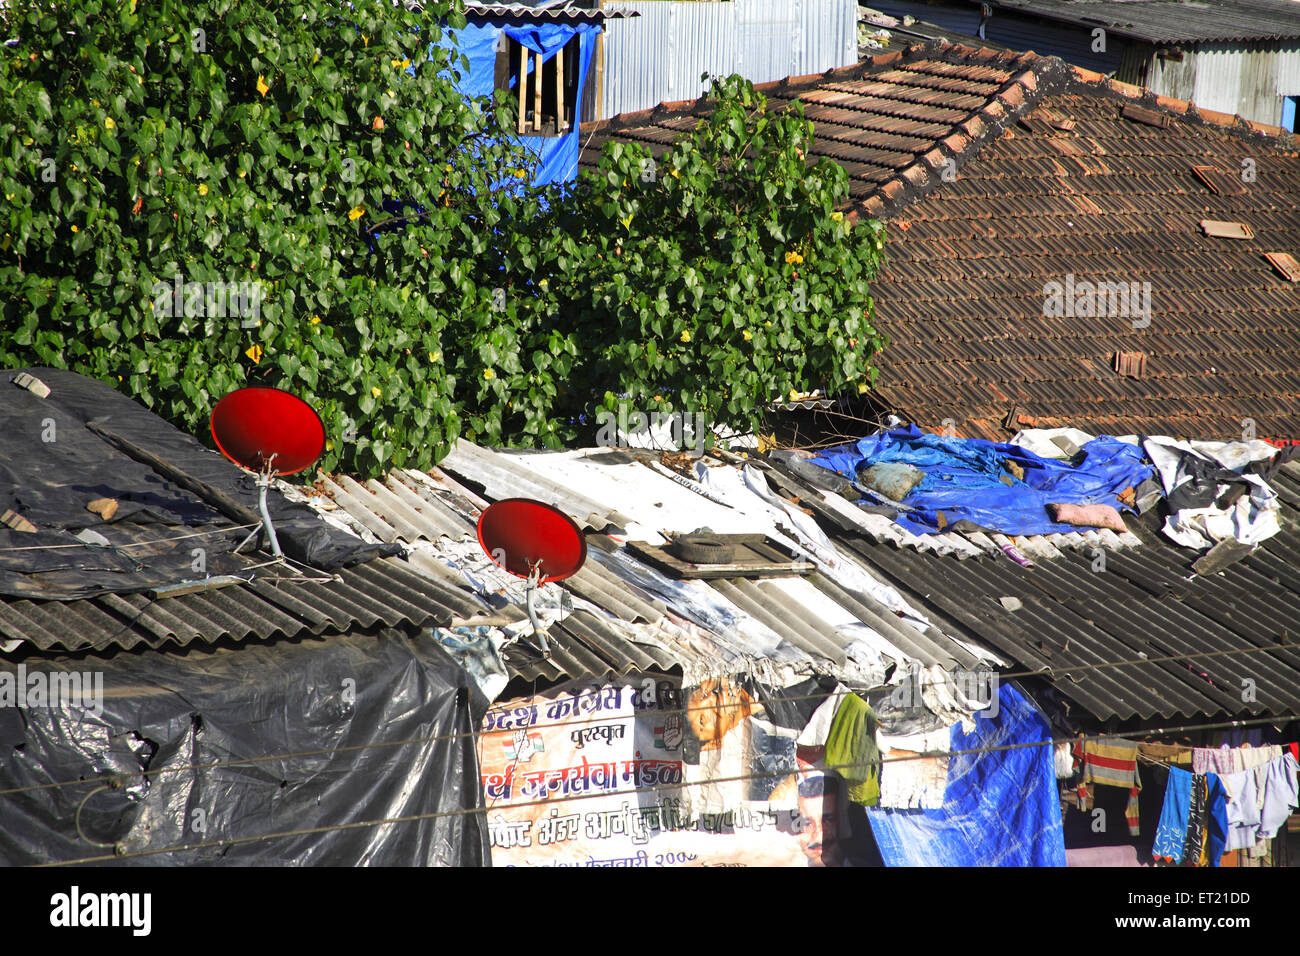 Dish antenna in slum ; Behram Naupada ; Anant Kanekar Marg ; Bandra ; Bombay Mumbai ; Maharashtra ; India 17 September - Stock Image